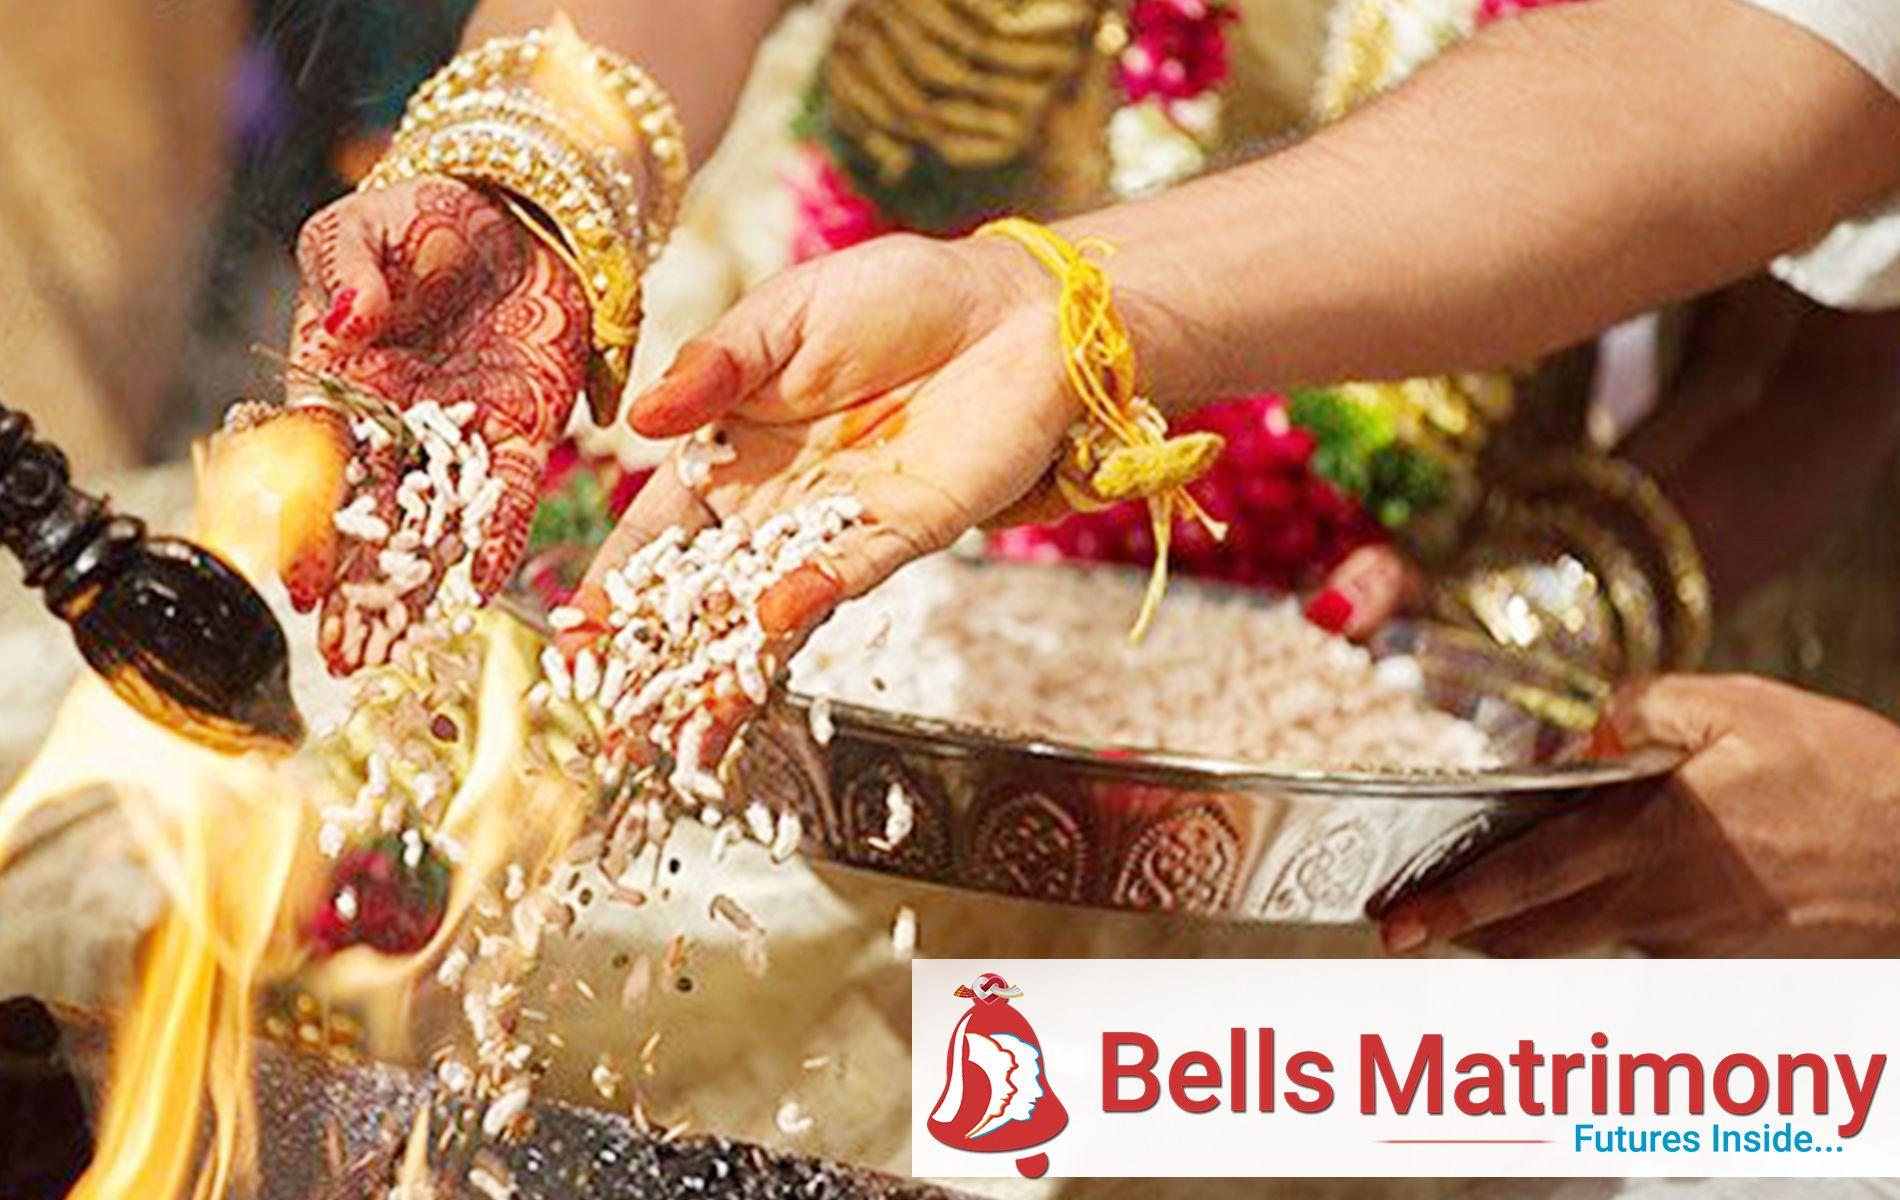 Bells Matrimony – Best online matrimony website for find